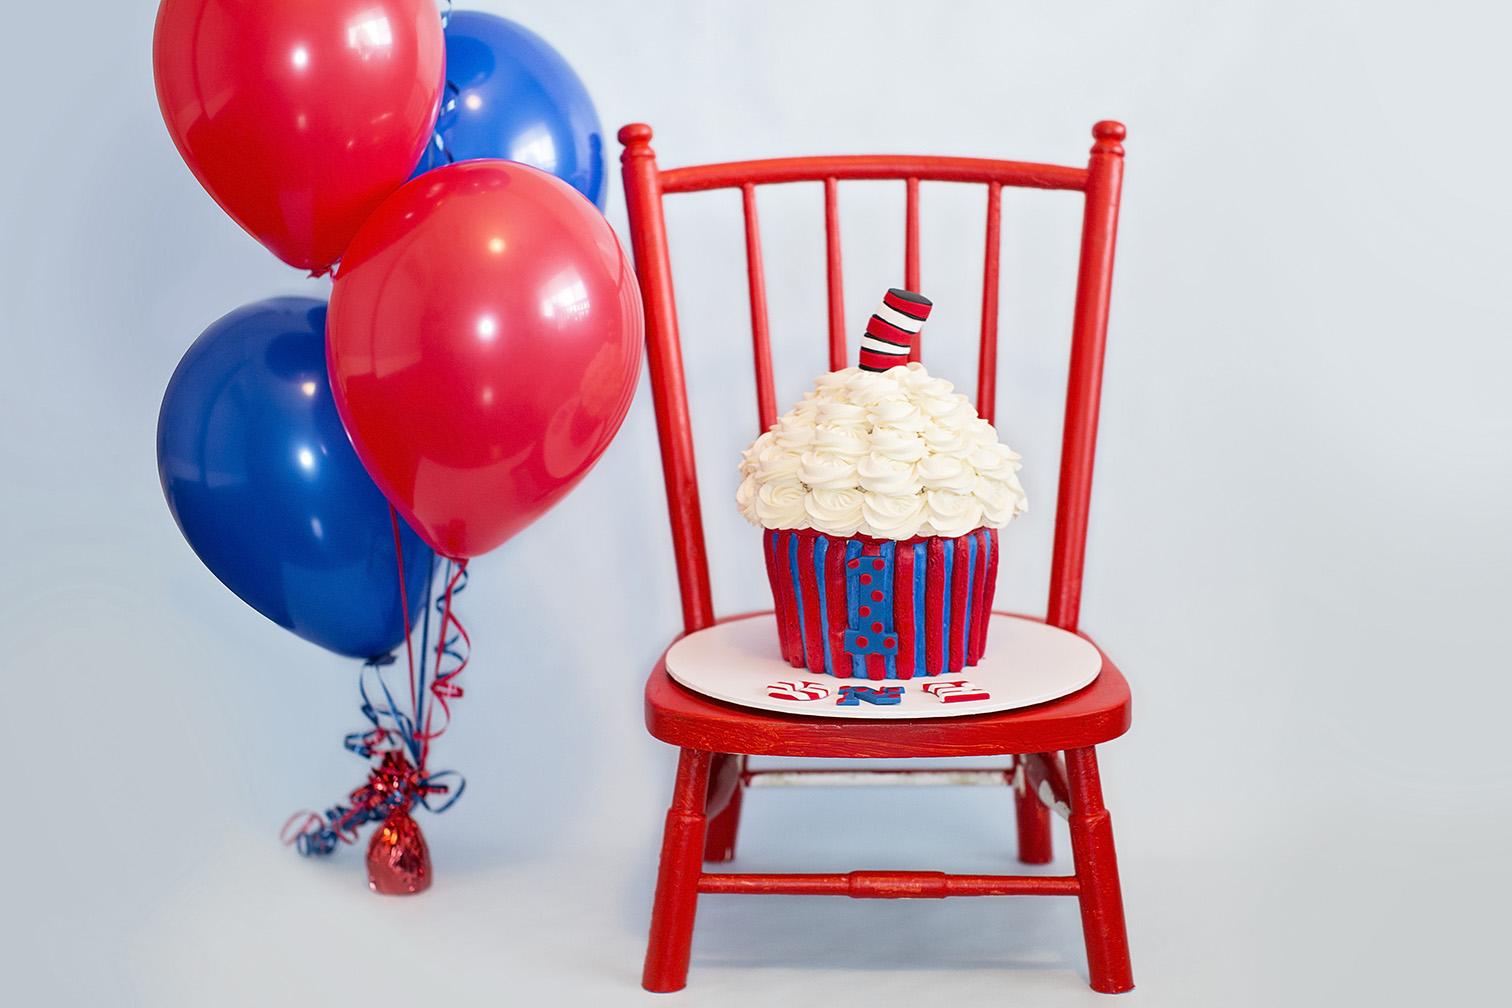 Doctor Seuss First Birthday Cake Smash 03.jpg